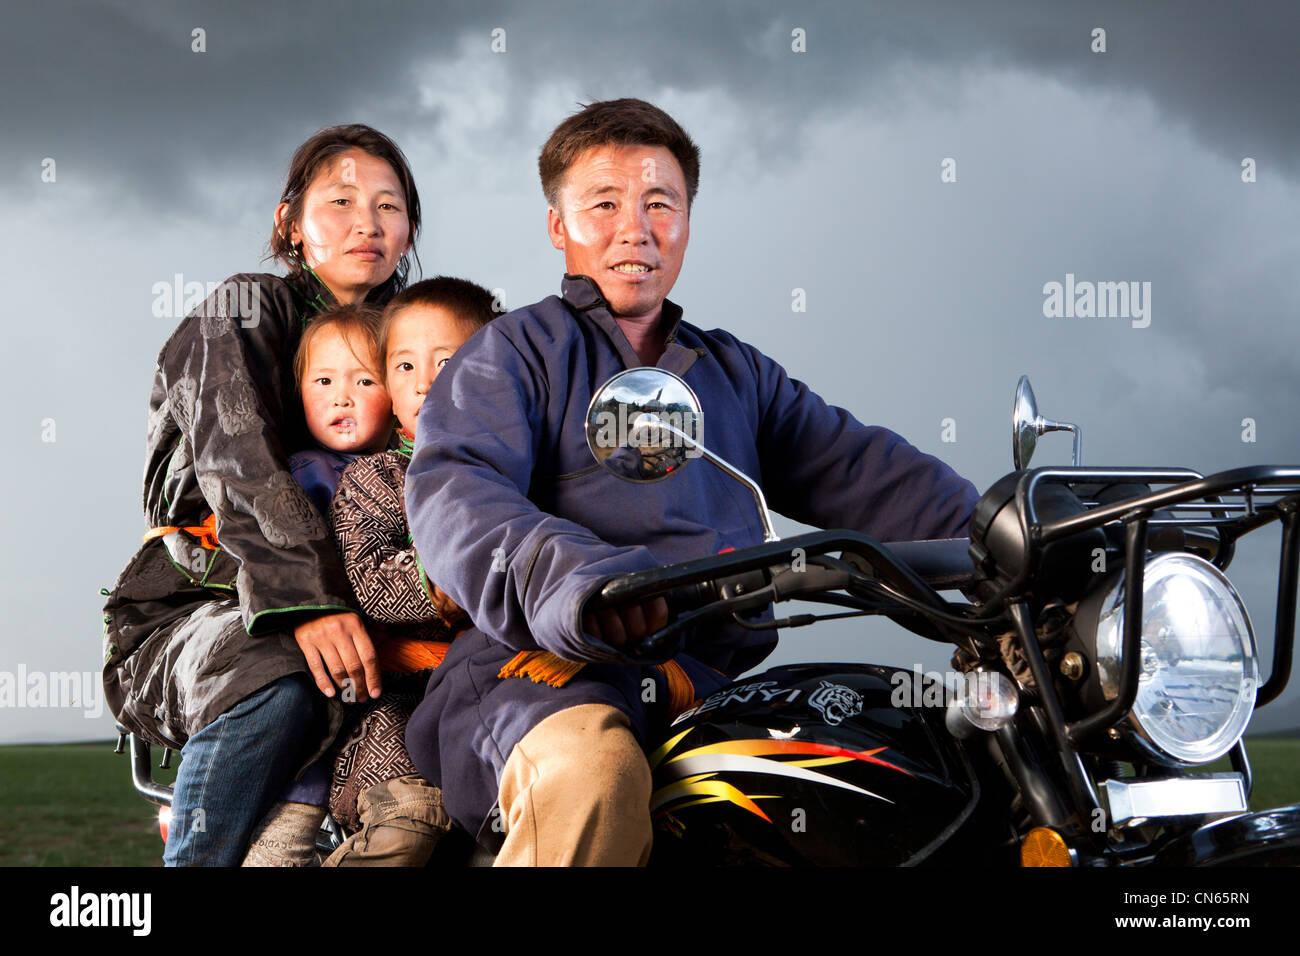 Familia mongólica en moto, khuduu aral, provincia de khentii, Mongolia Imagen De Stock